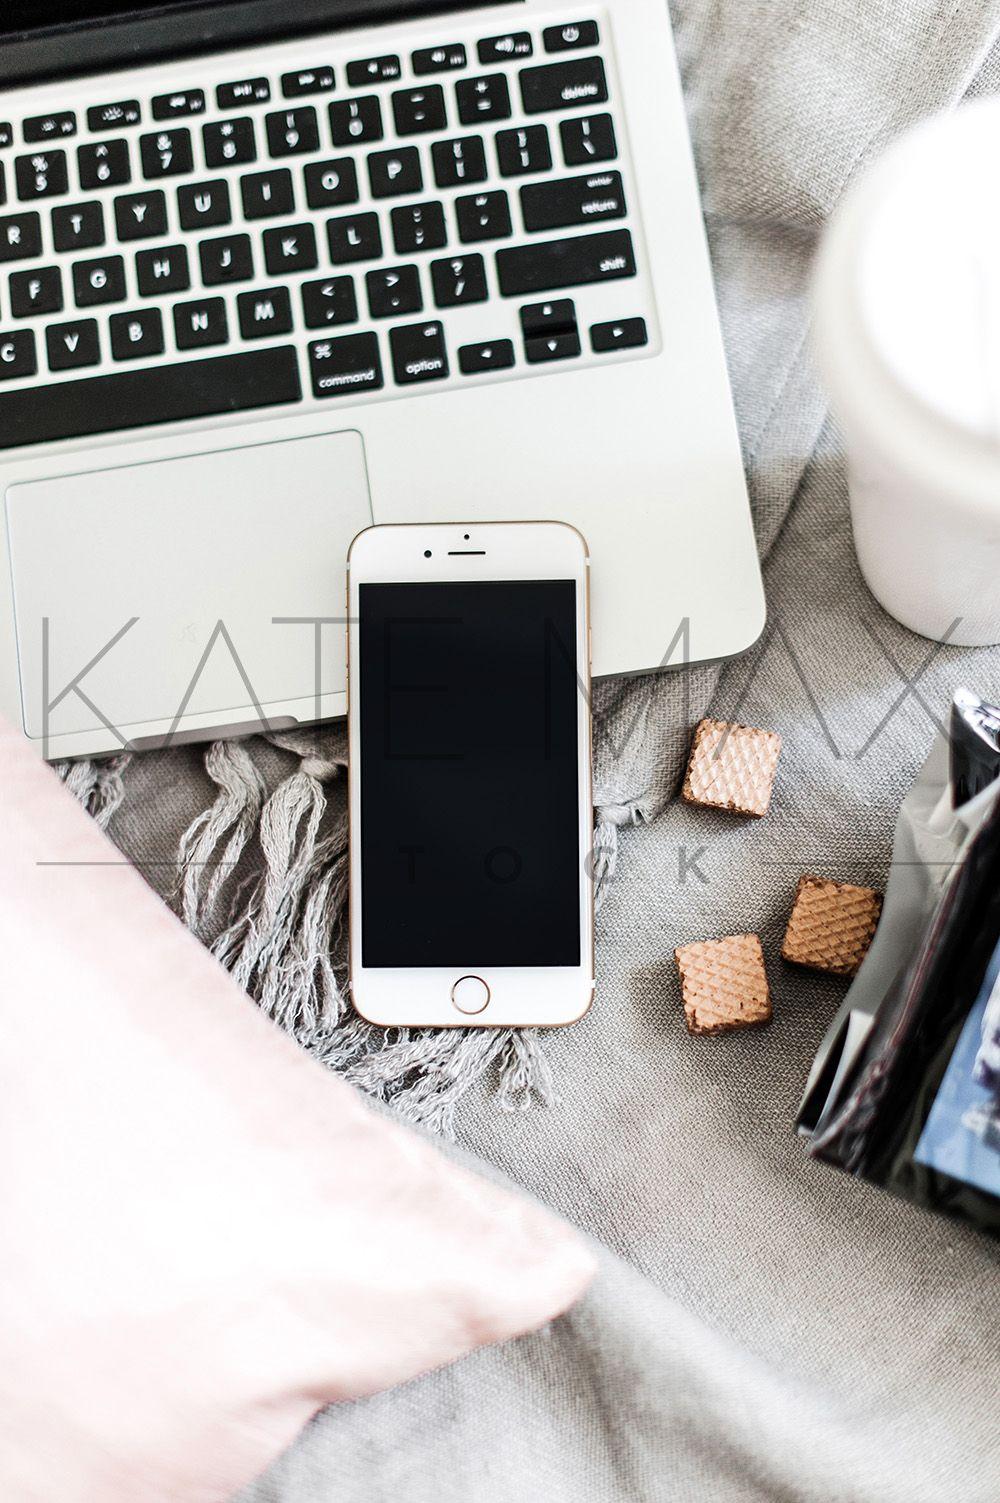 Download Gorgeous Feminine Lifestyle Stock Photos For Girlbosses Everywhere Grab This Stunning Iphone Mockup At Katemaxstock Com